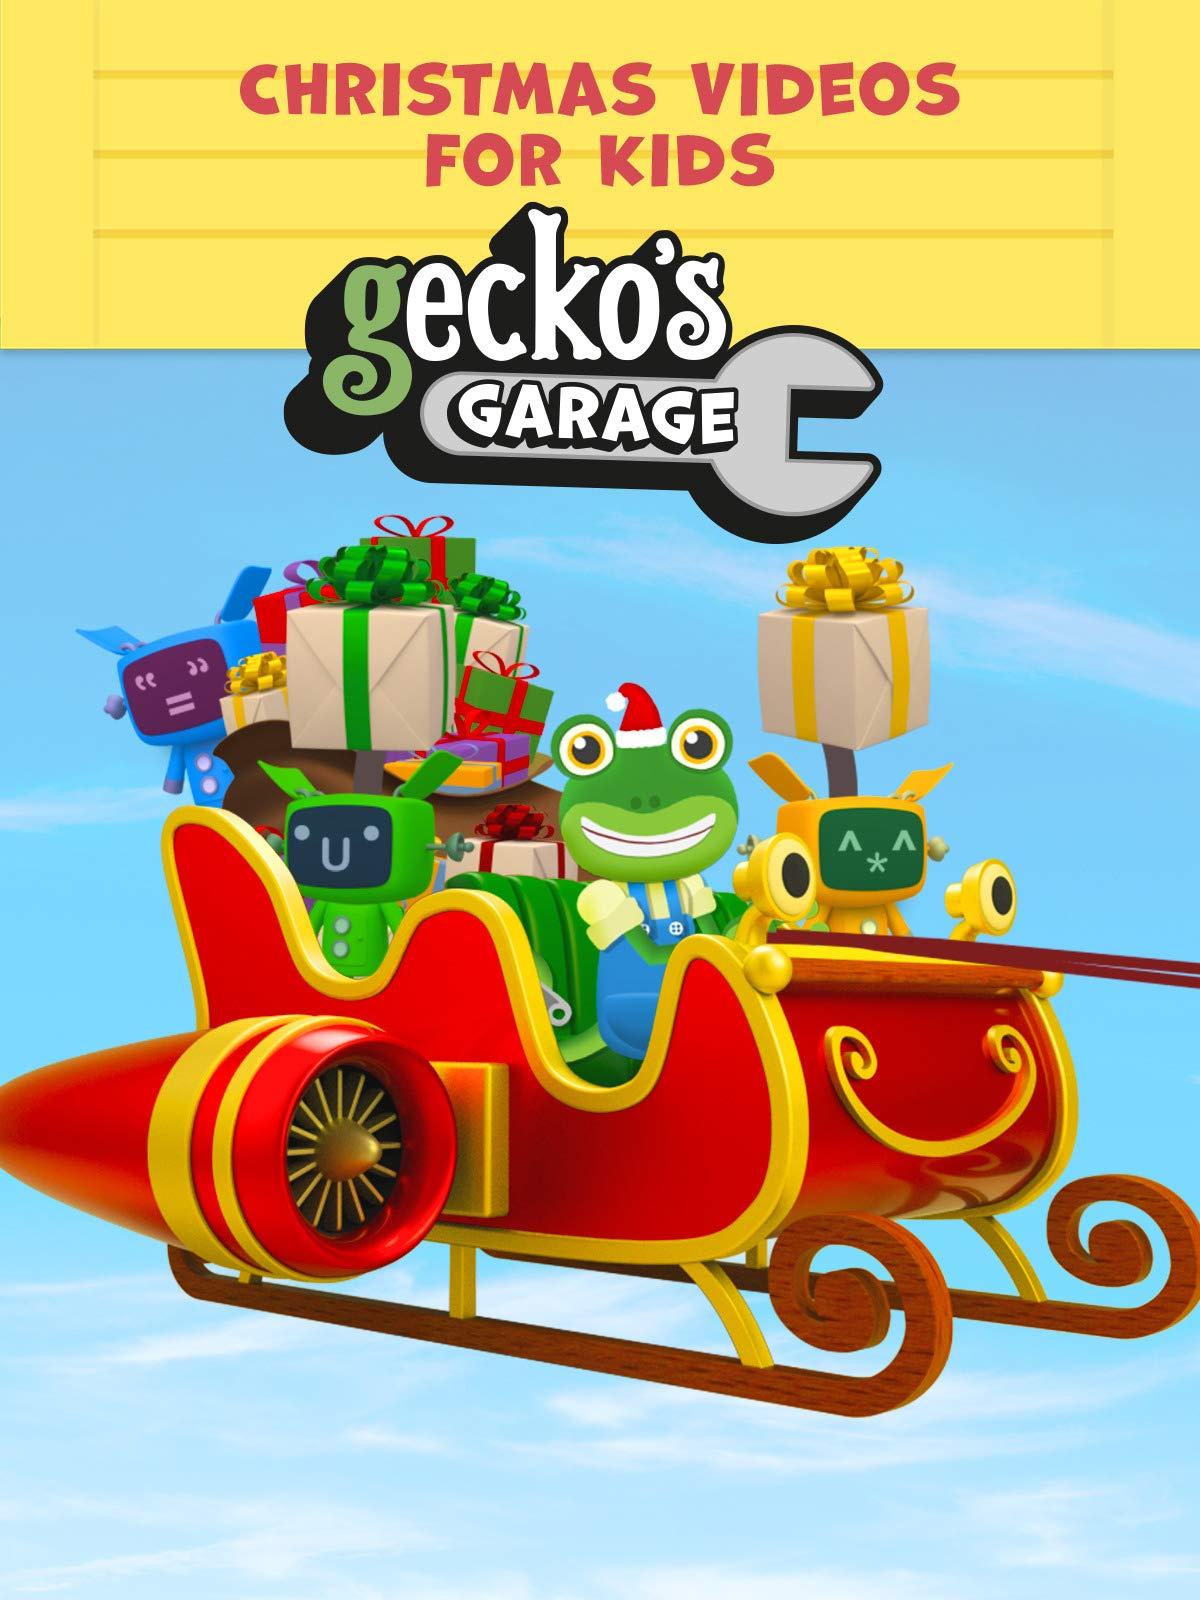 Gecko's Garage - Christmas Videos for Kids on Amazon Prime Video UK